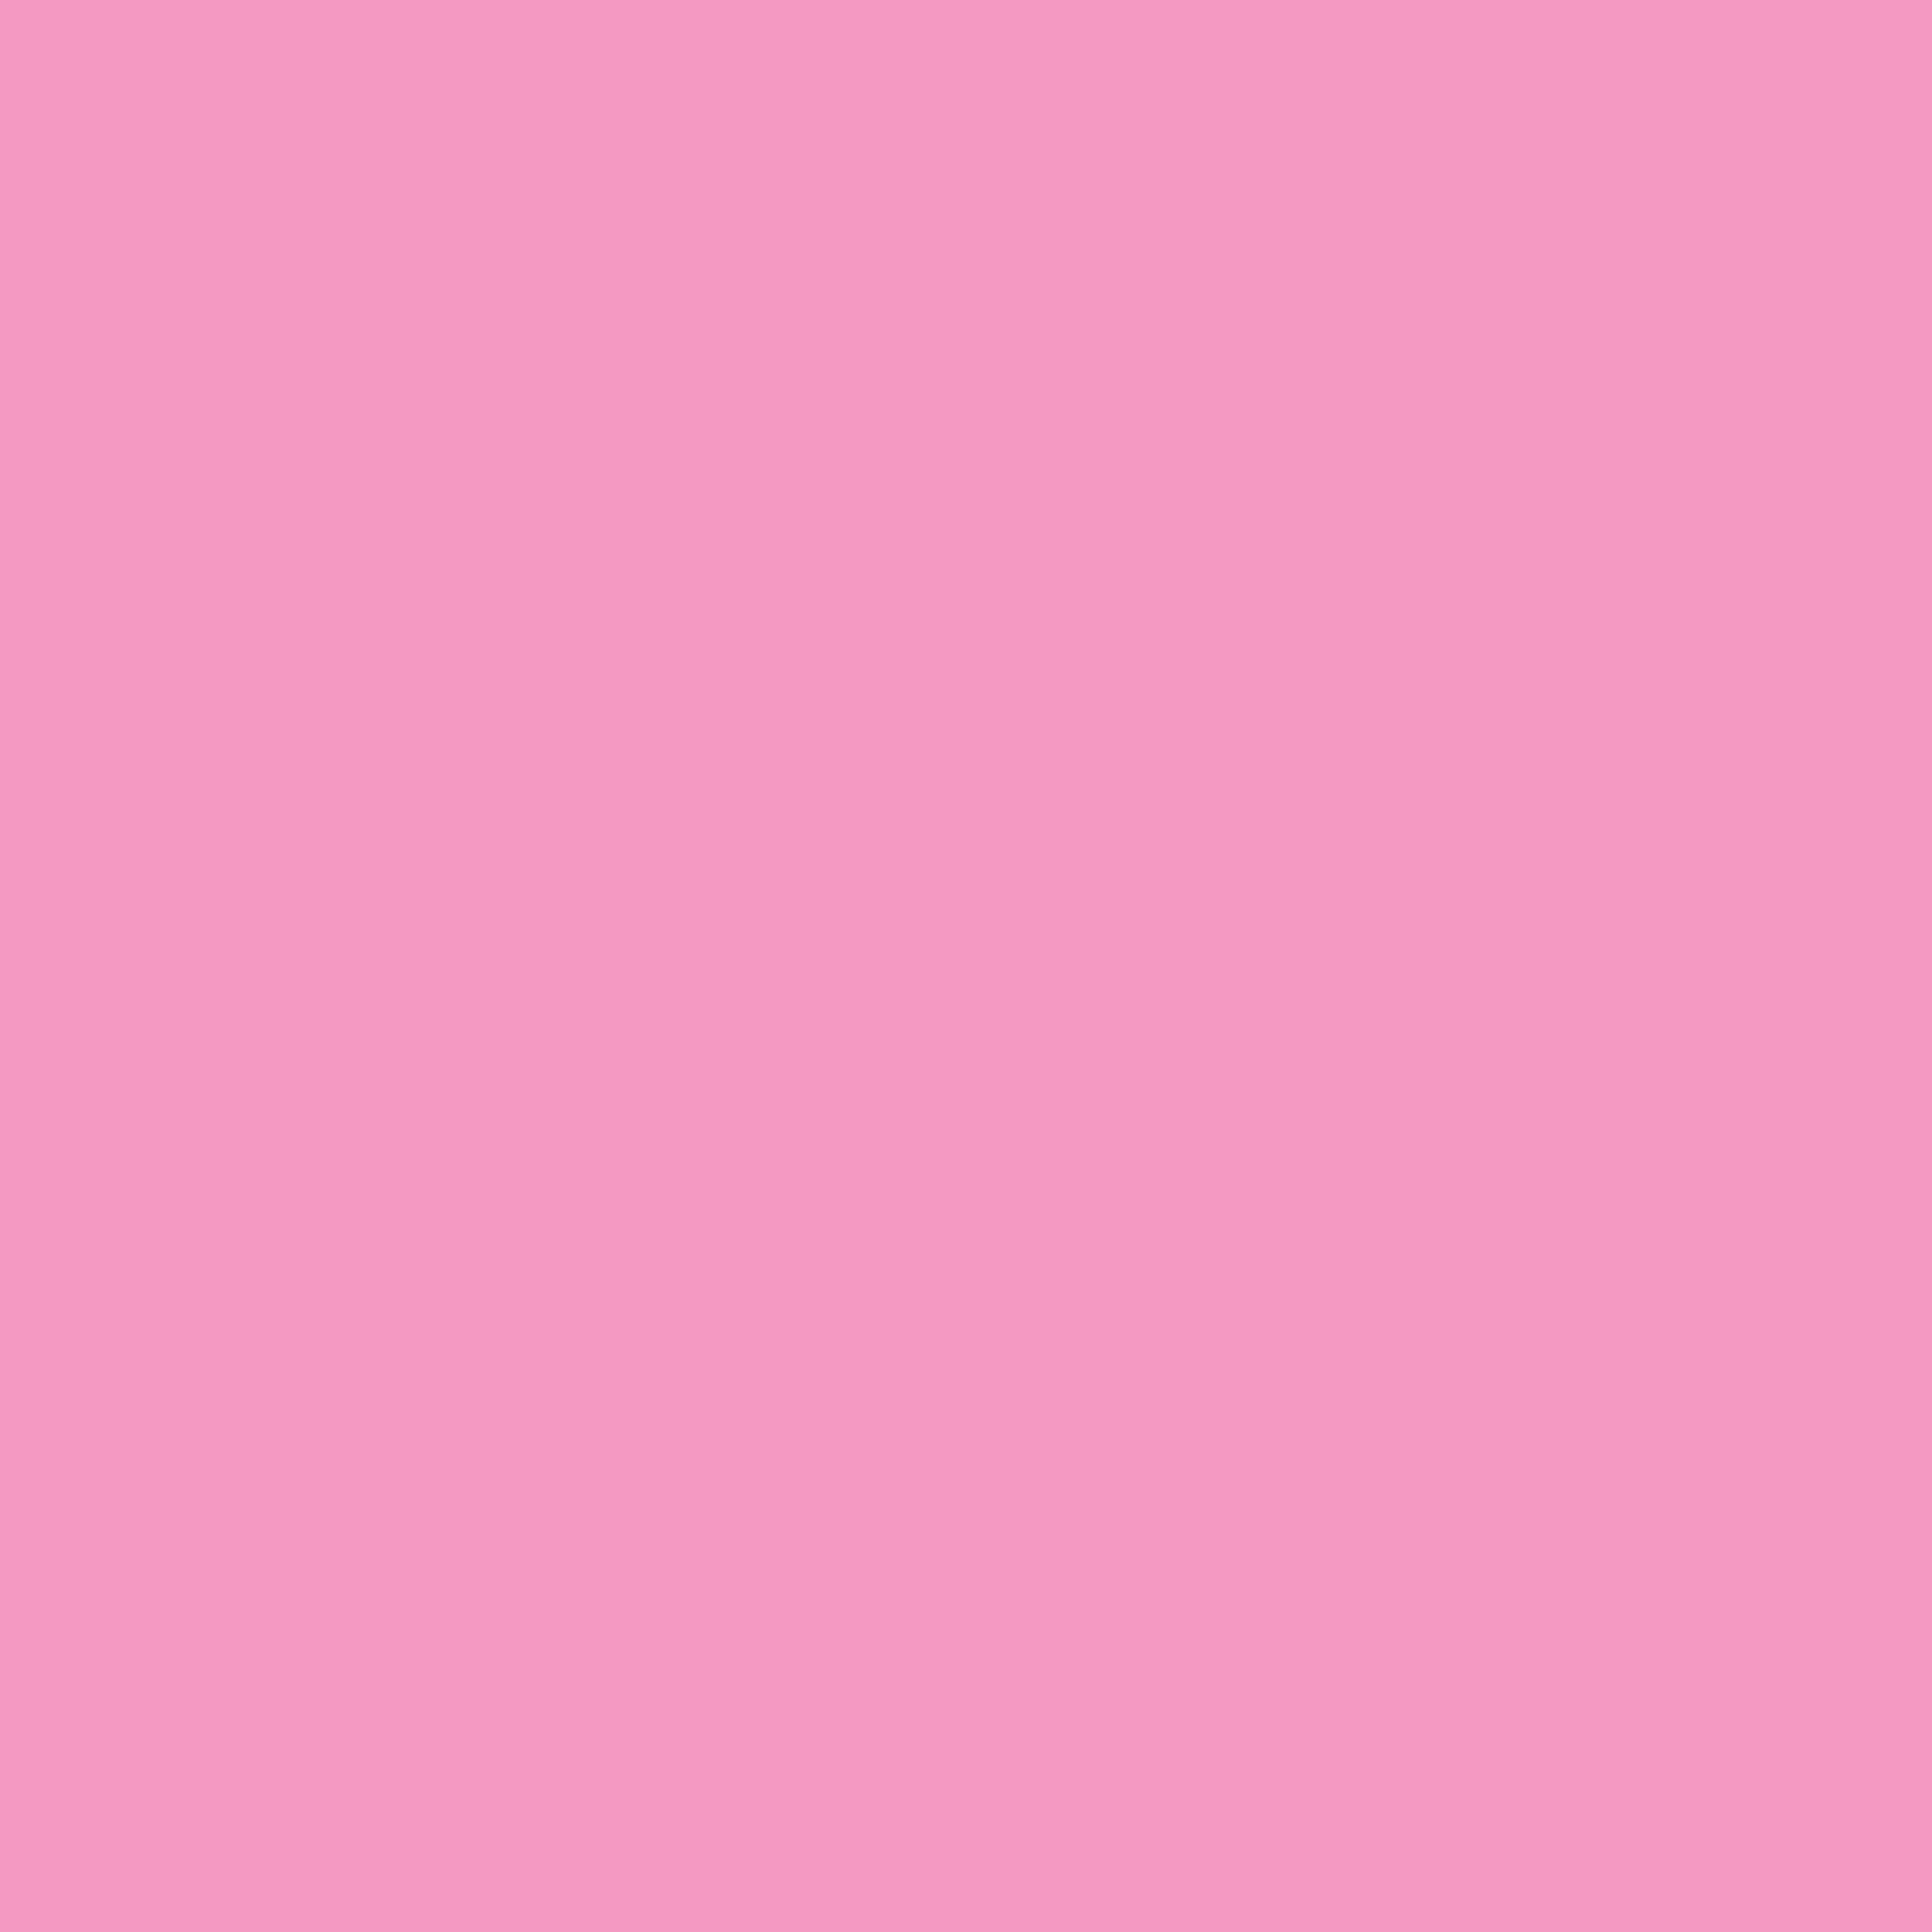 2048x2048 Pastel Magenta Solid Color Background